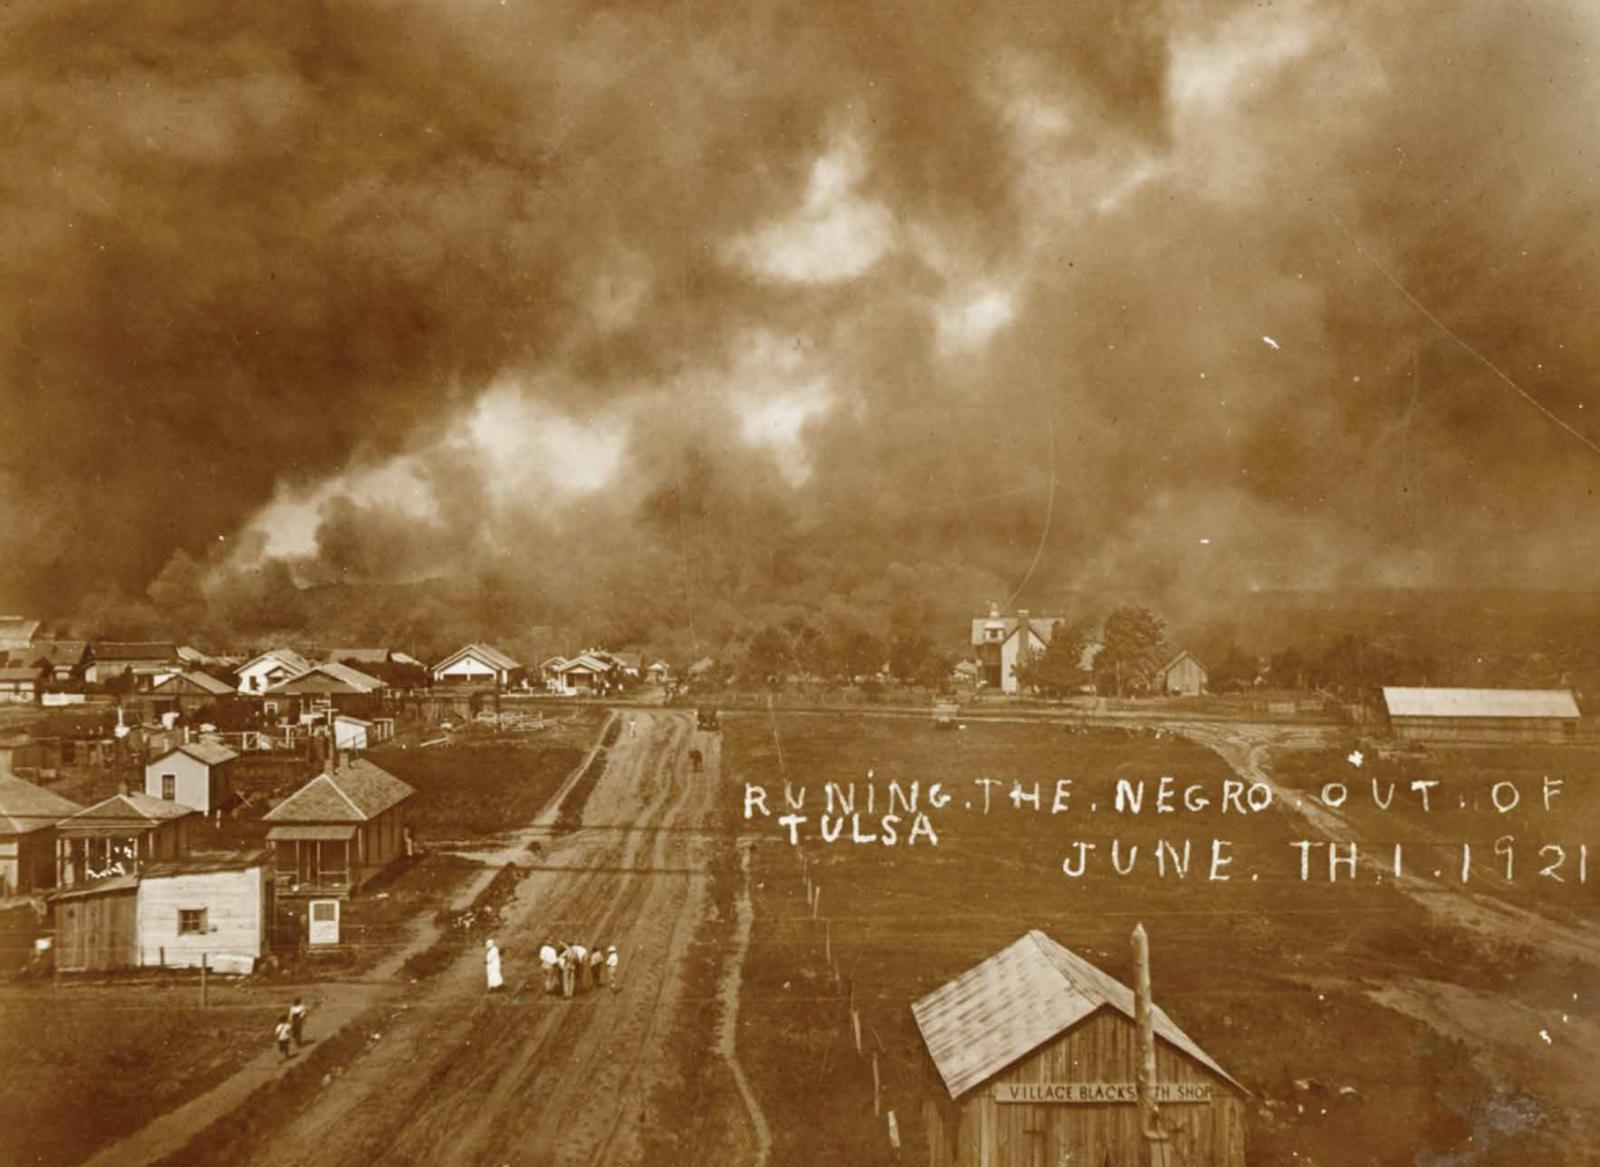 Tulsa Massacre - 1921